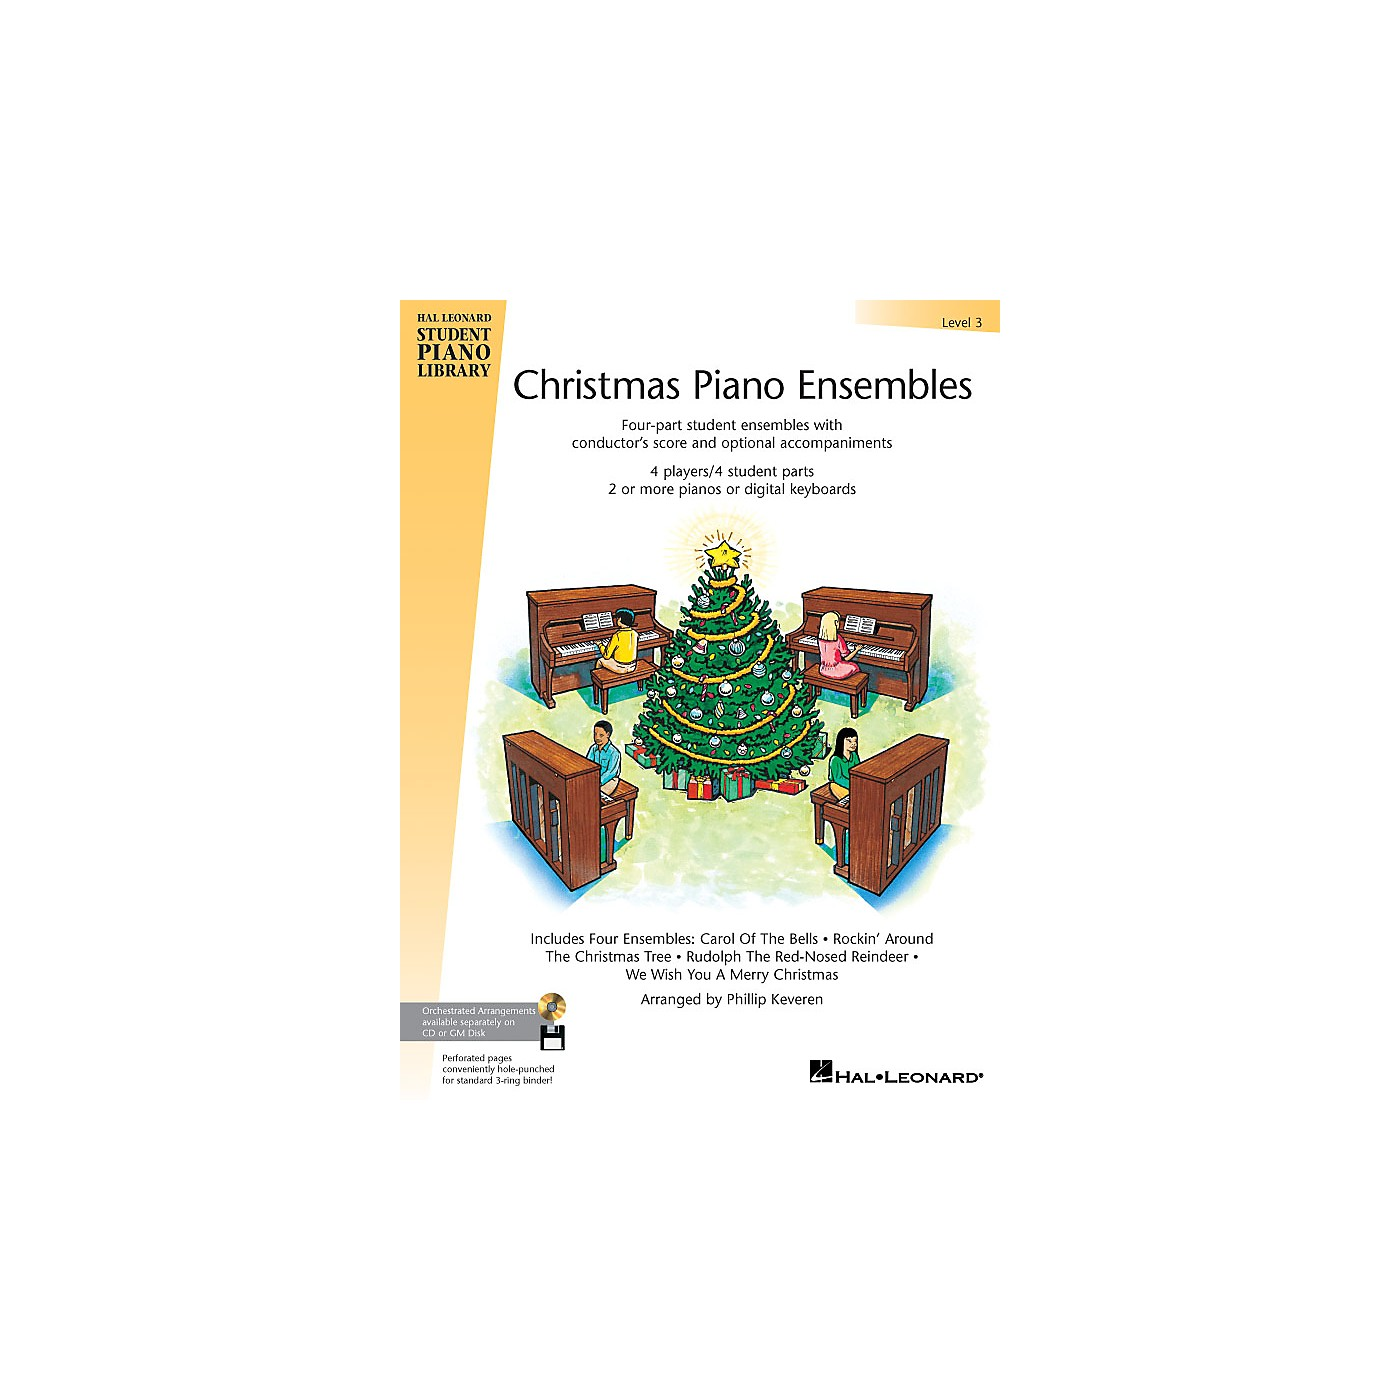 Hal Leonard Christmas Piano Ensembles - Level 3 Book Piano Library Series (Level Late Elem) thumbnail